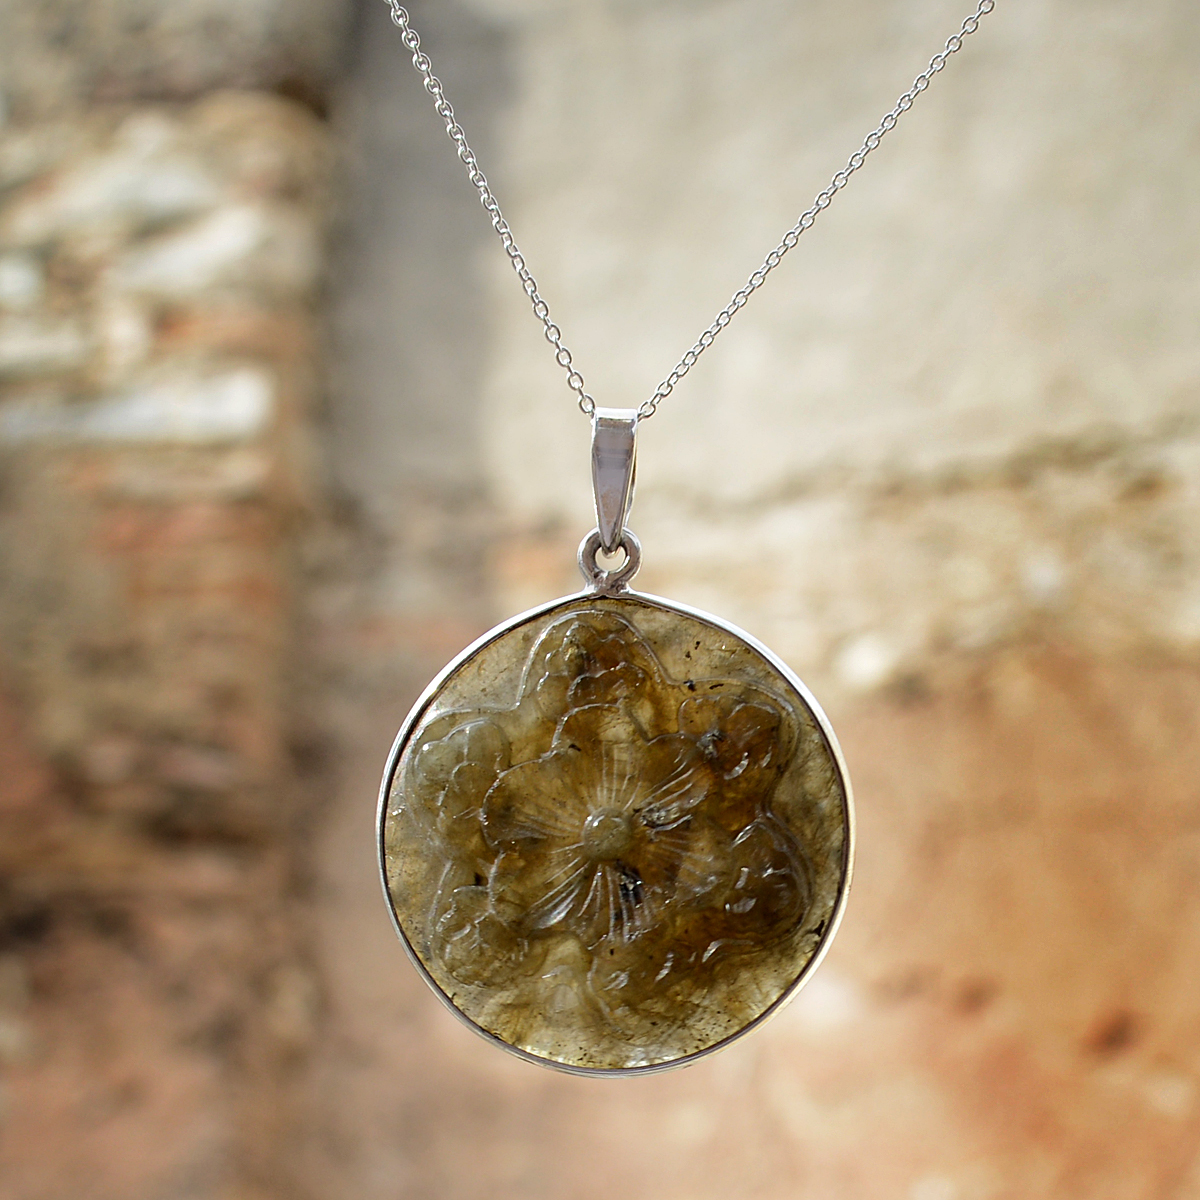 Labradorite Silver Pendant Necklace  PG-156266